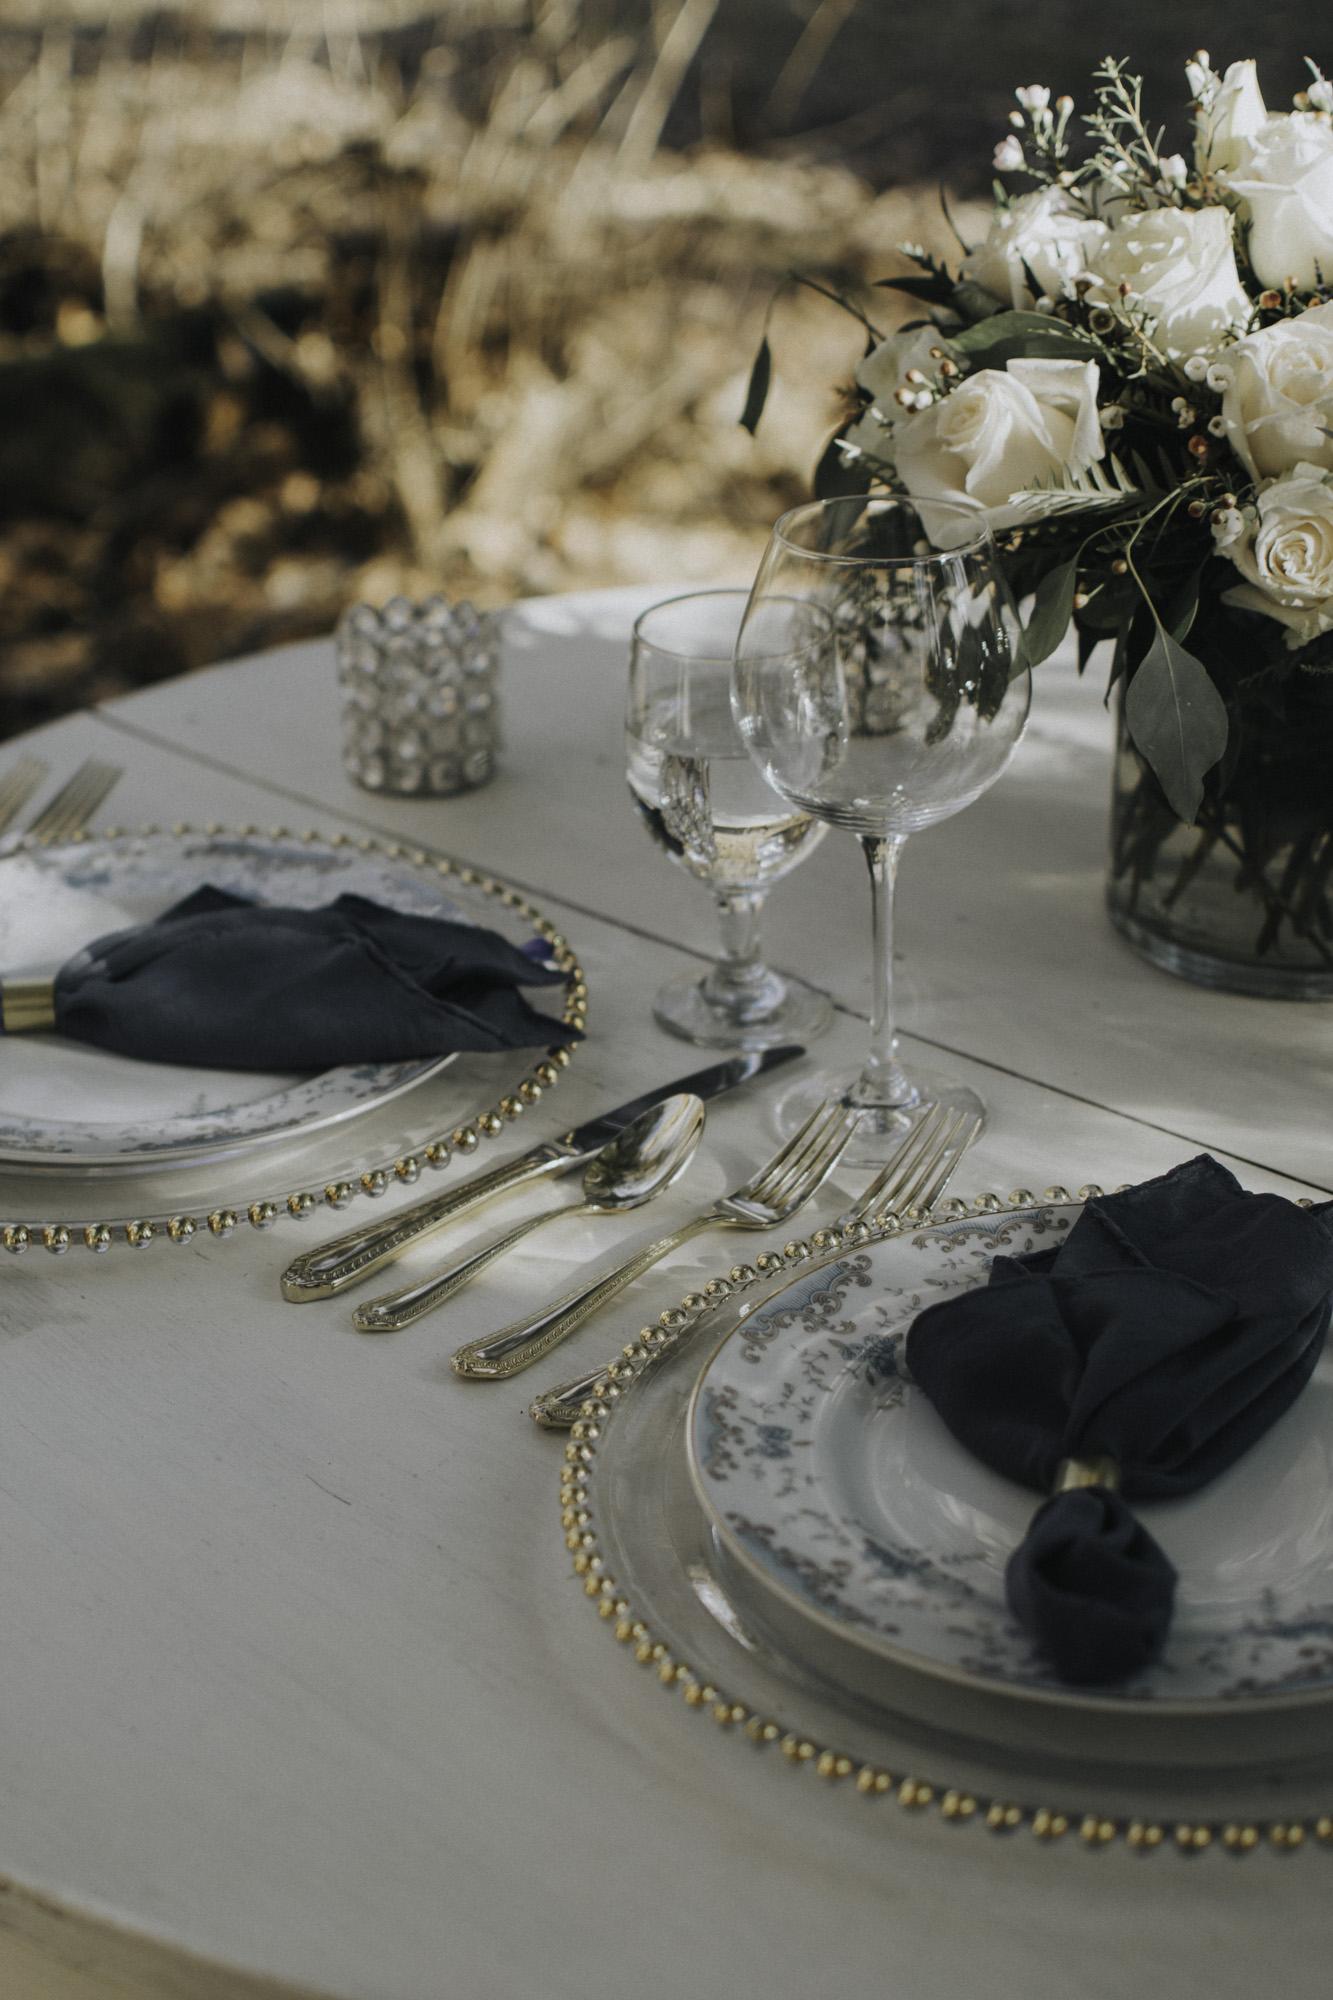 Cate_Ann_Photography_Dayton_Ohio_Wedding_Elopement_And_Engagement_PhotographerDSC_5818.jpg